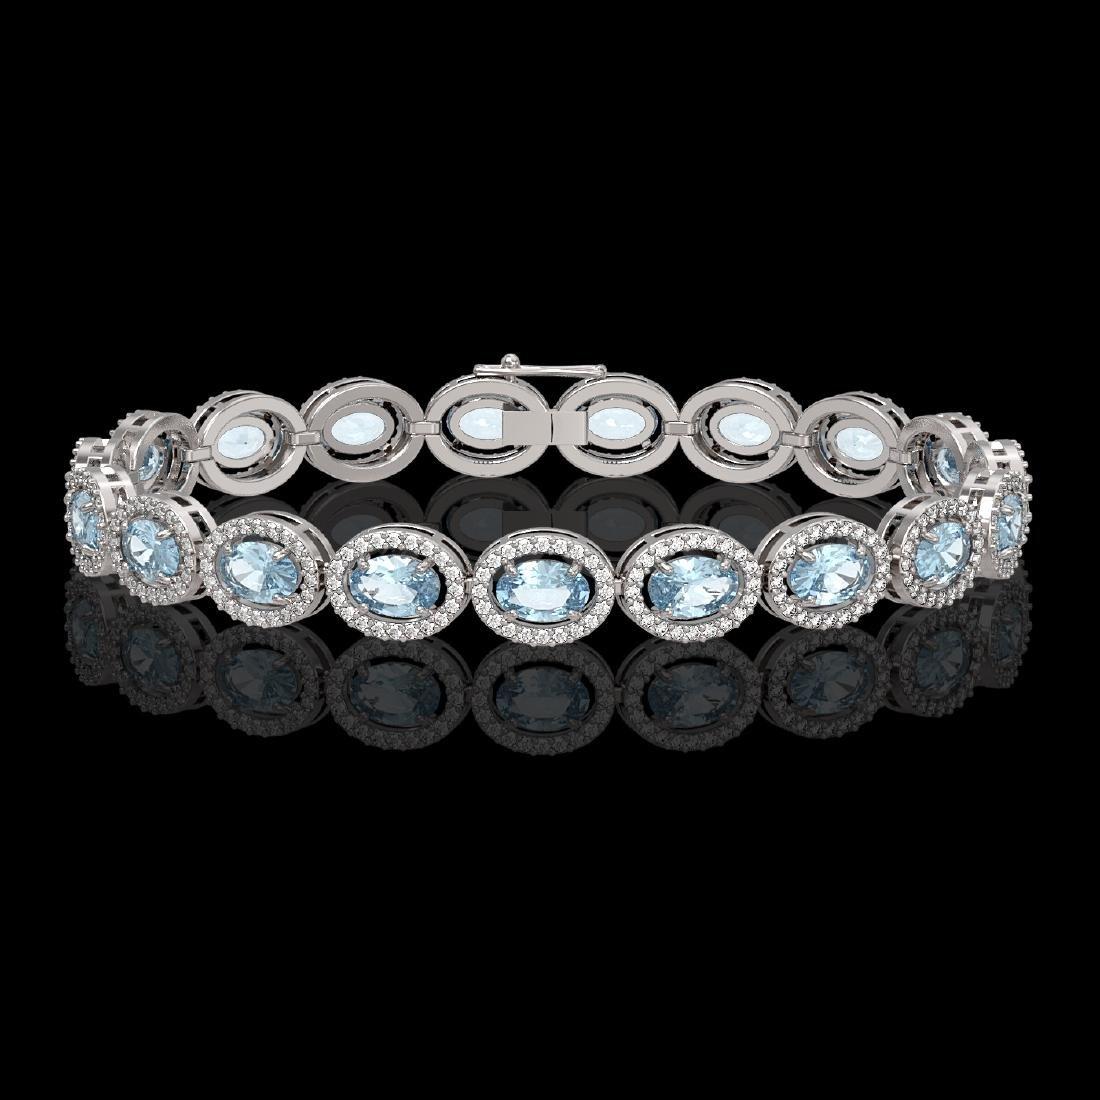 11.02 CTW Aquamarine & Diamond Halo Bracelet 10K White